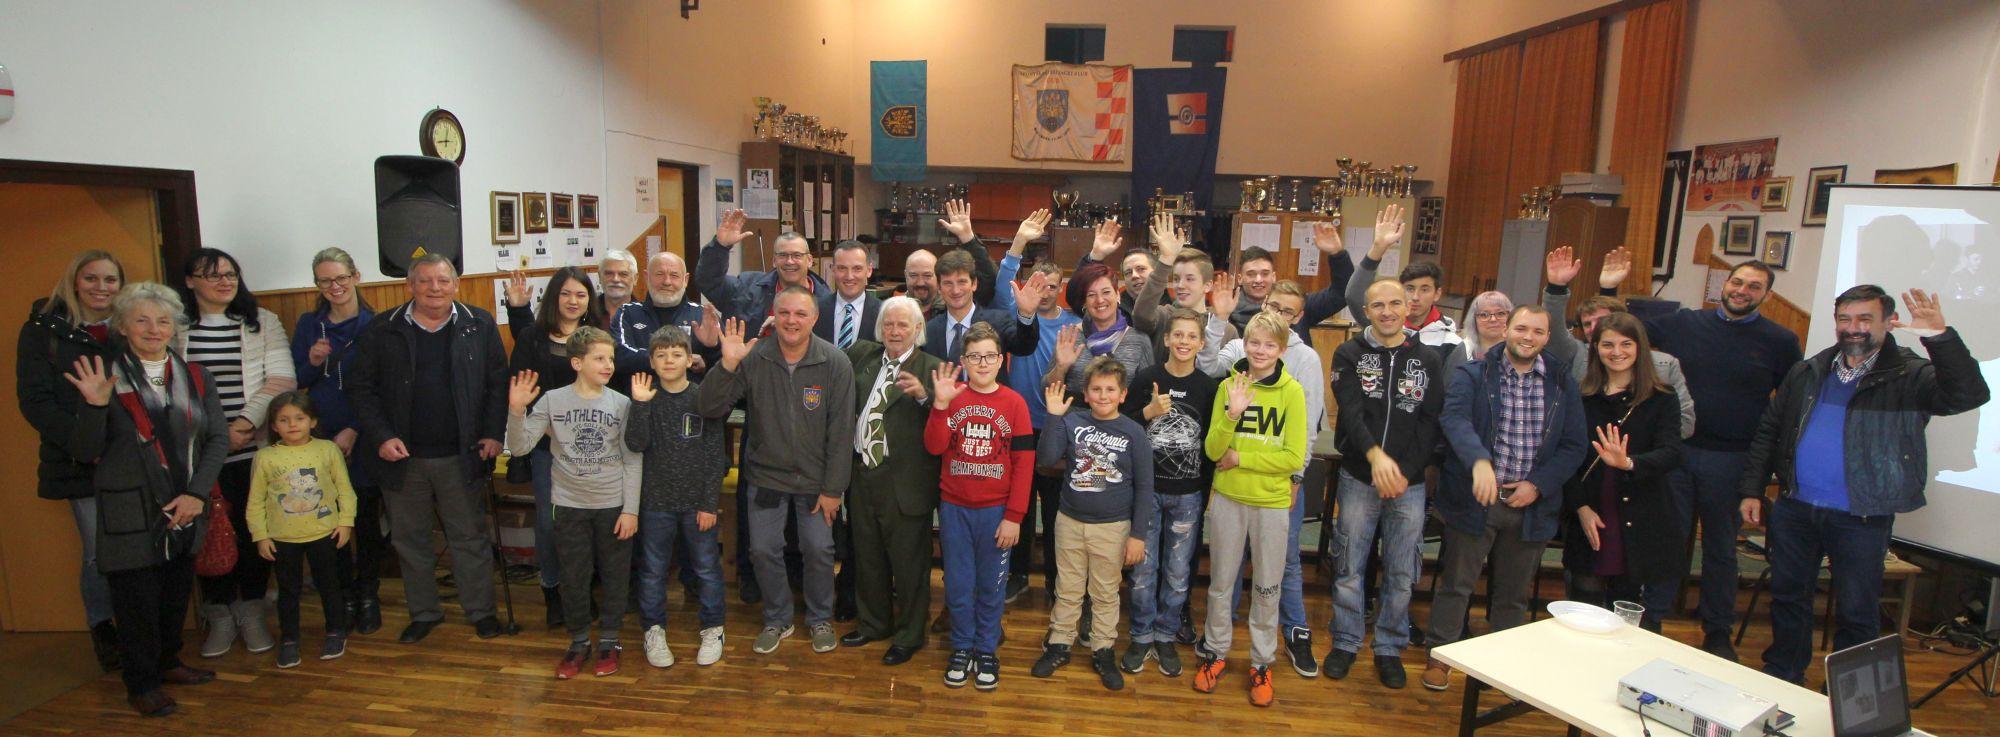 Športski streljački klub Dubašnica proslavio 40. ti rođendan